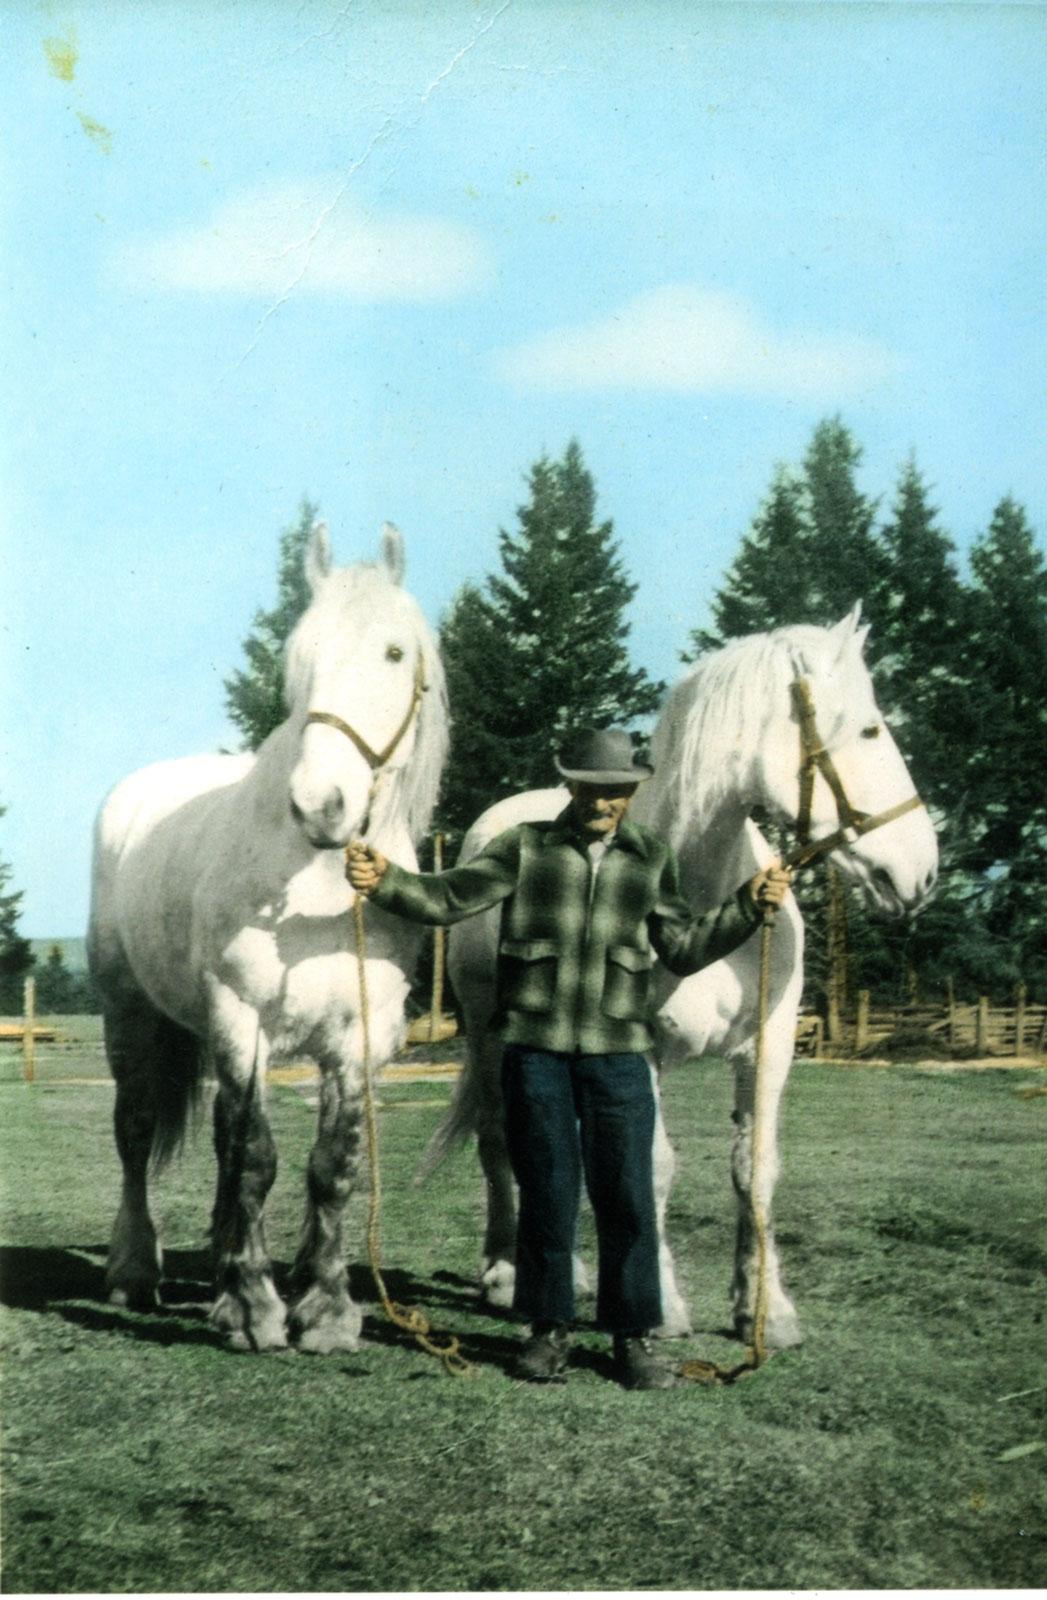 Joe LePage With Logging Horses, 1947